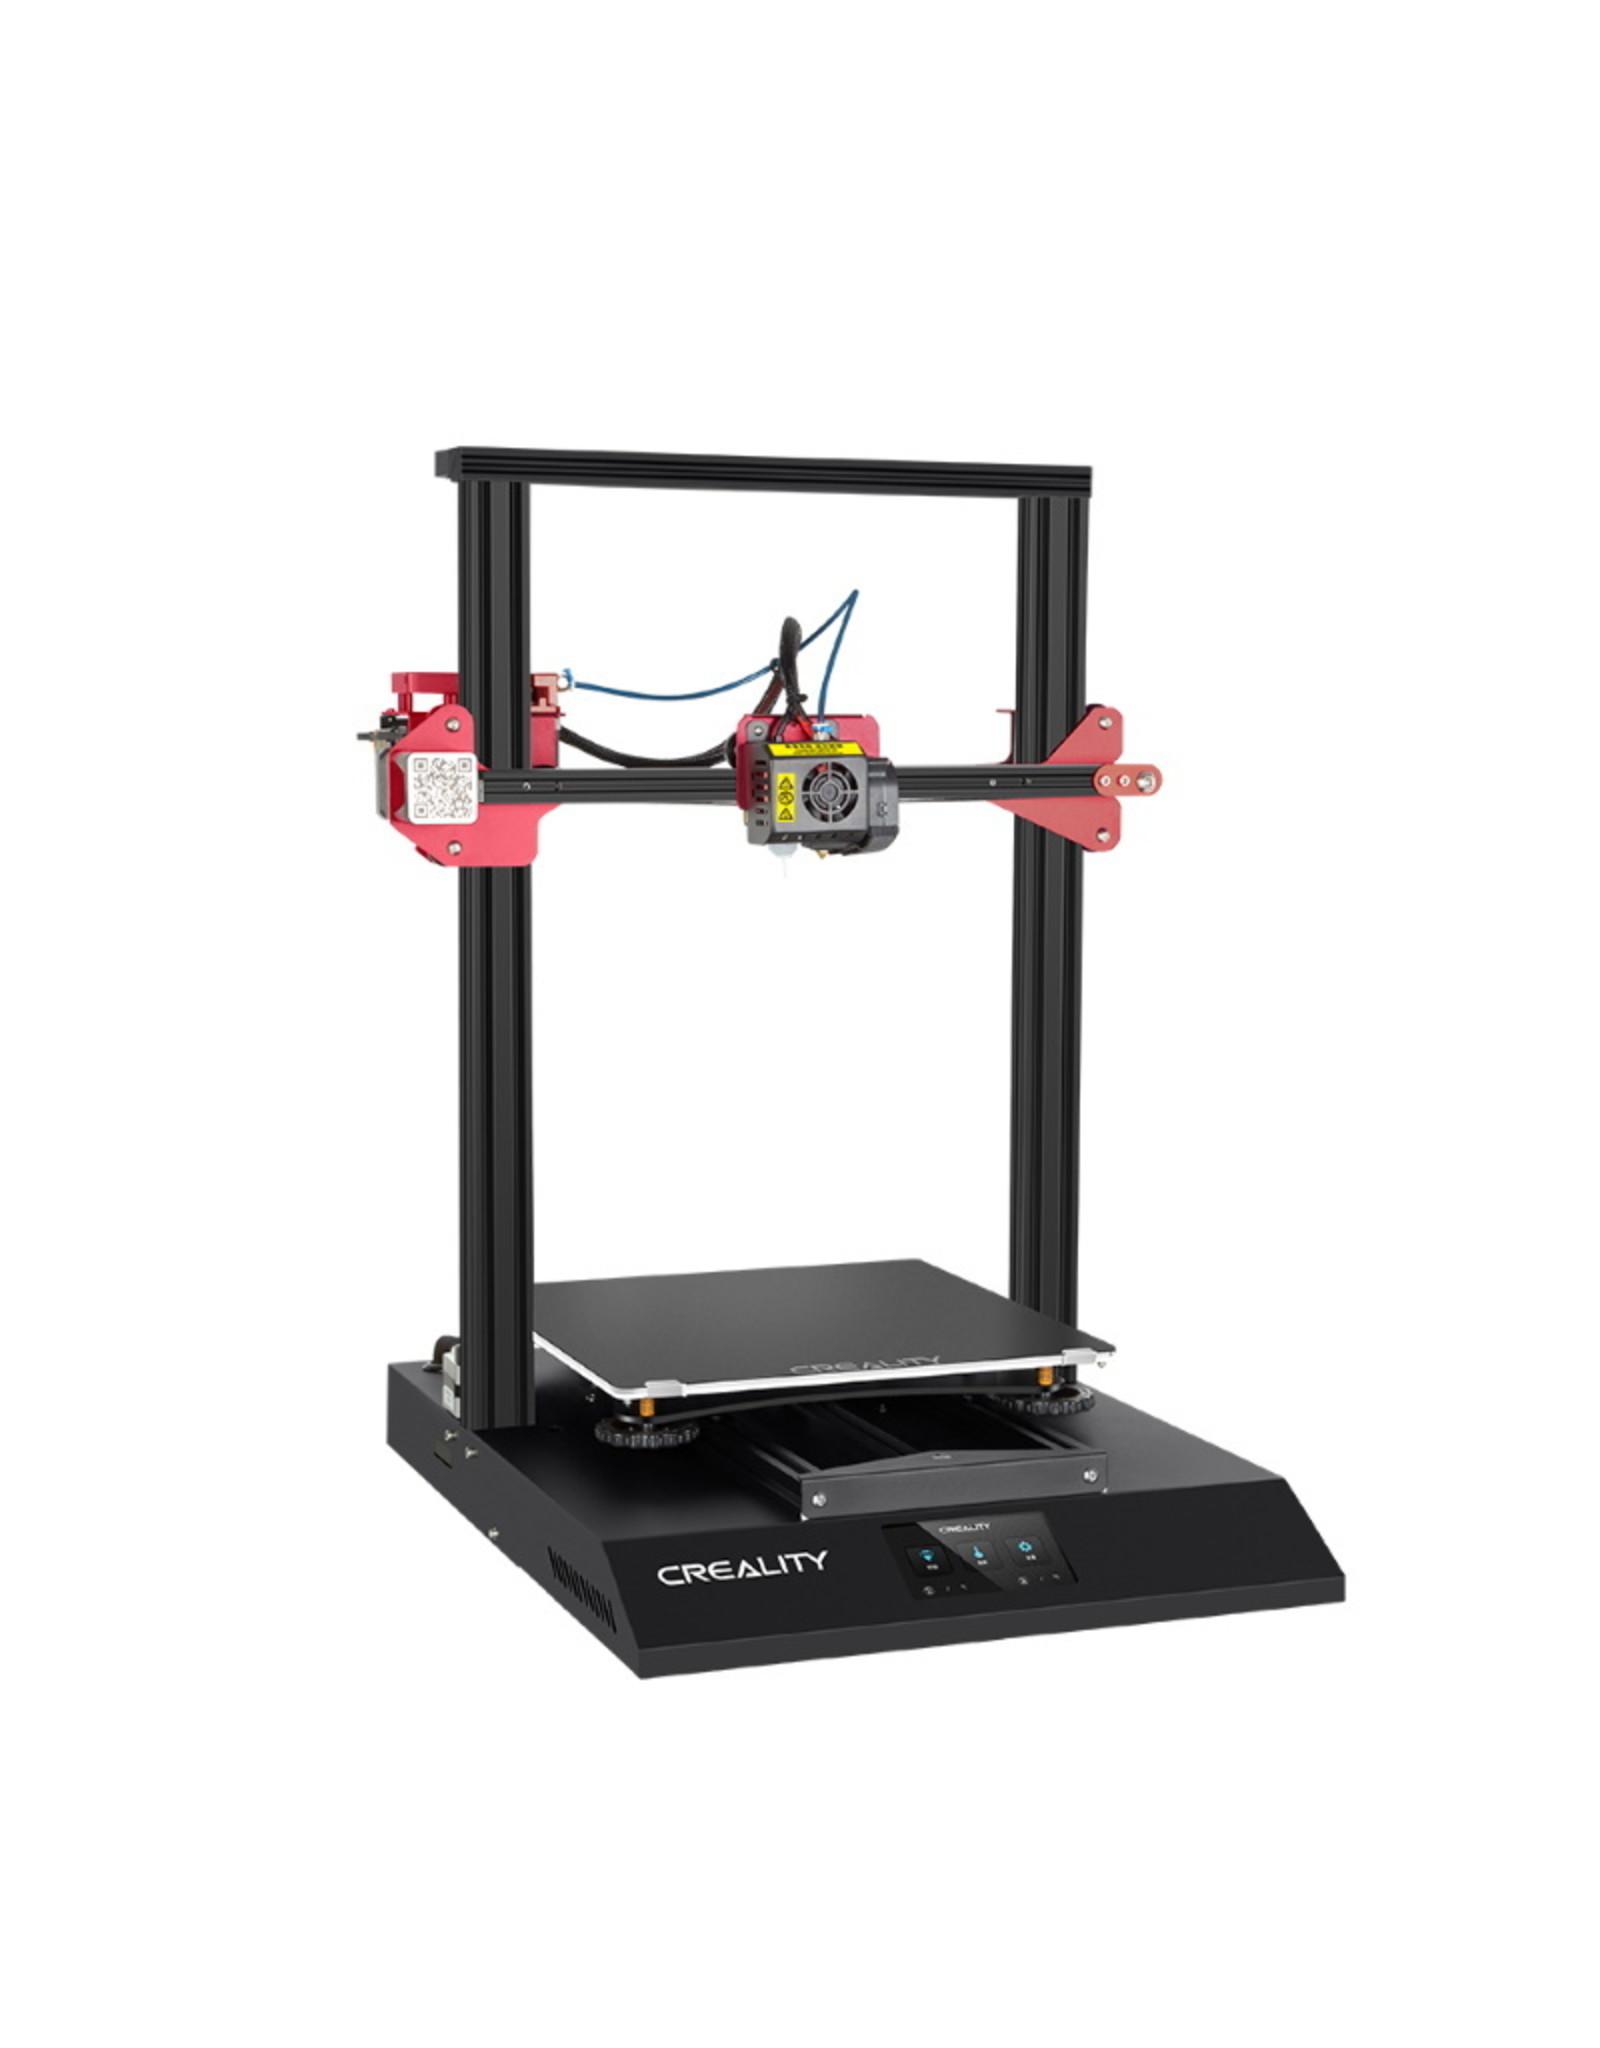 Creality/Ender Creality CR-10S PRO v2 3D-printer